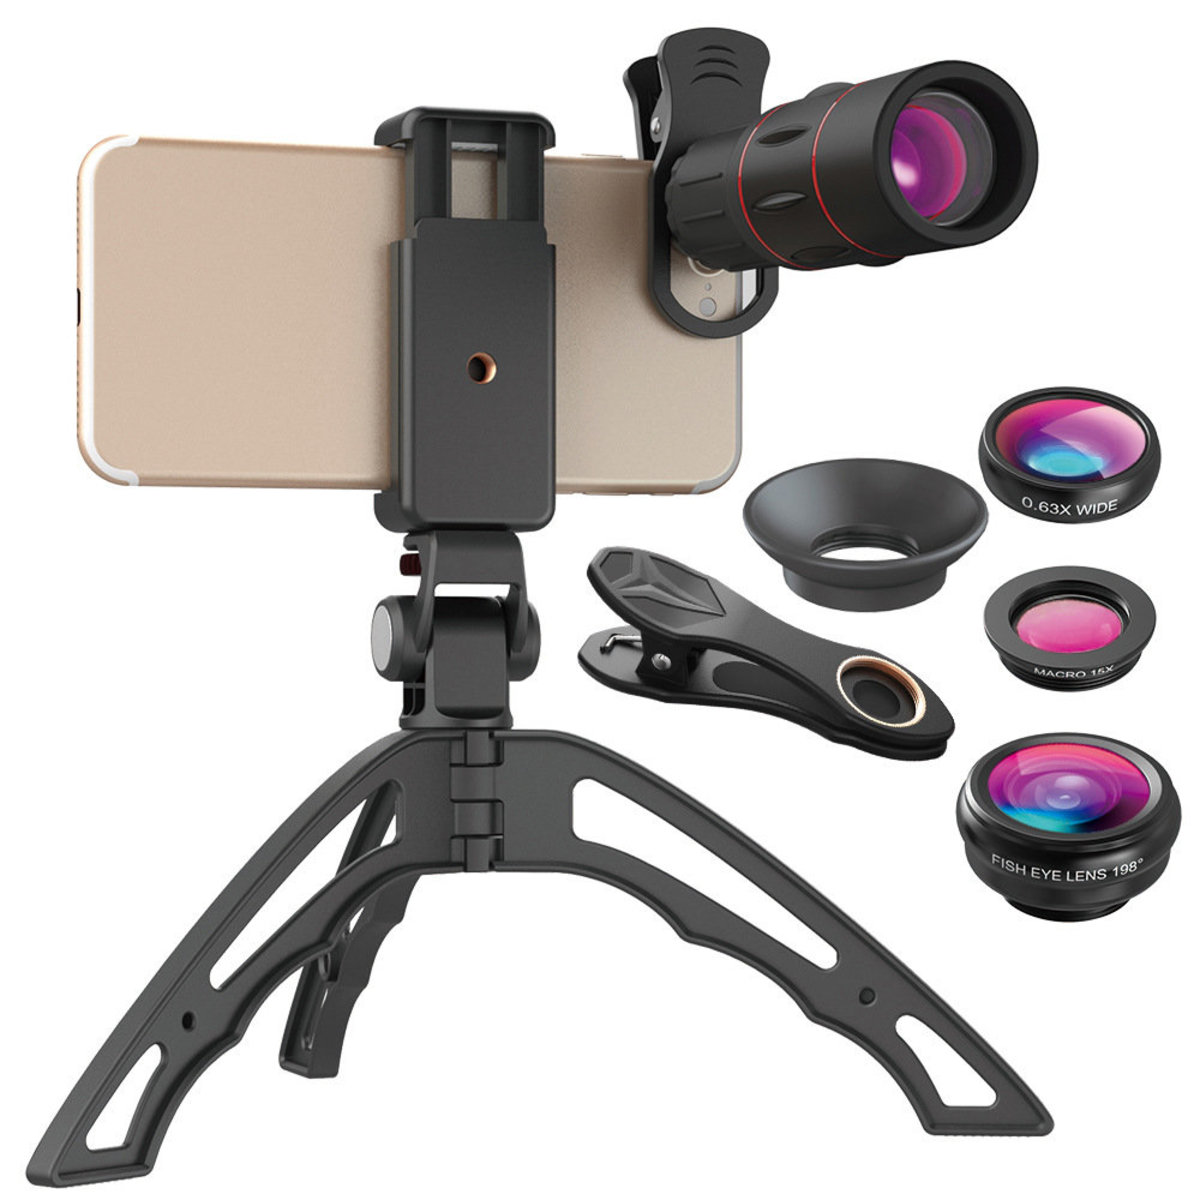 Hotbuy 4 IN 1 Phone Camera Lens kit